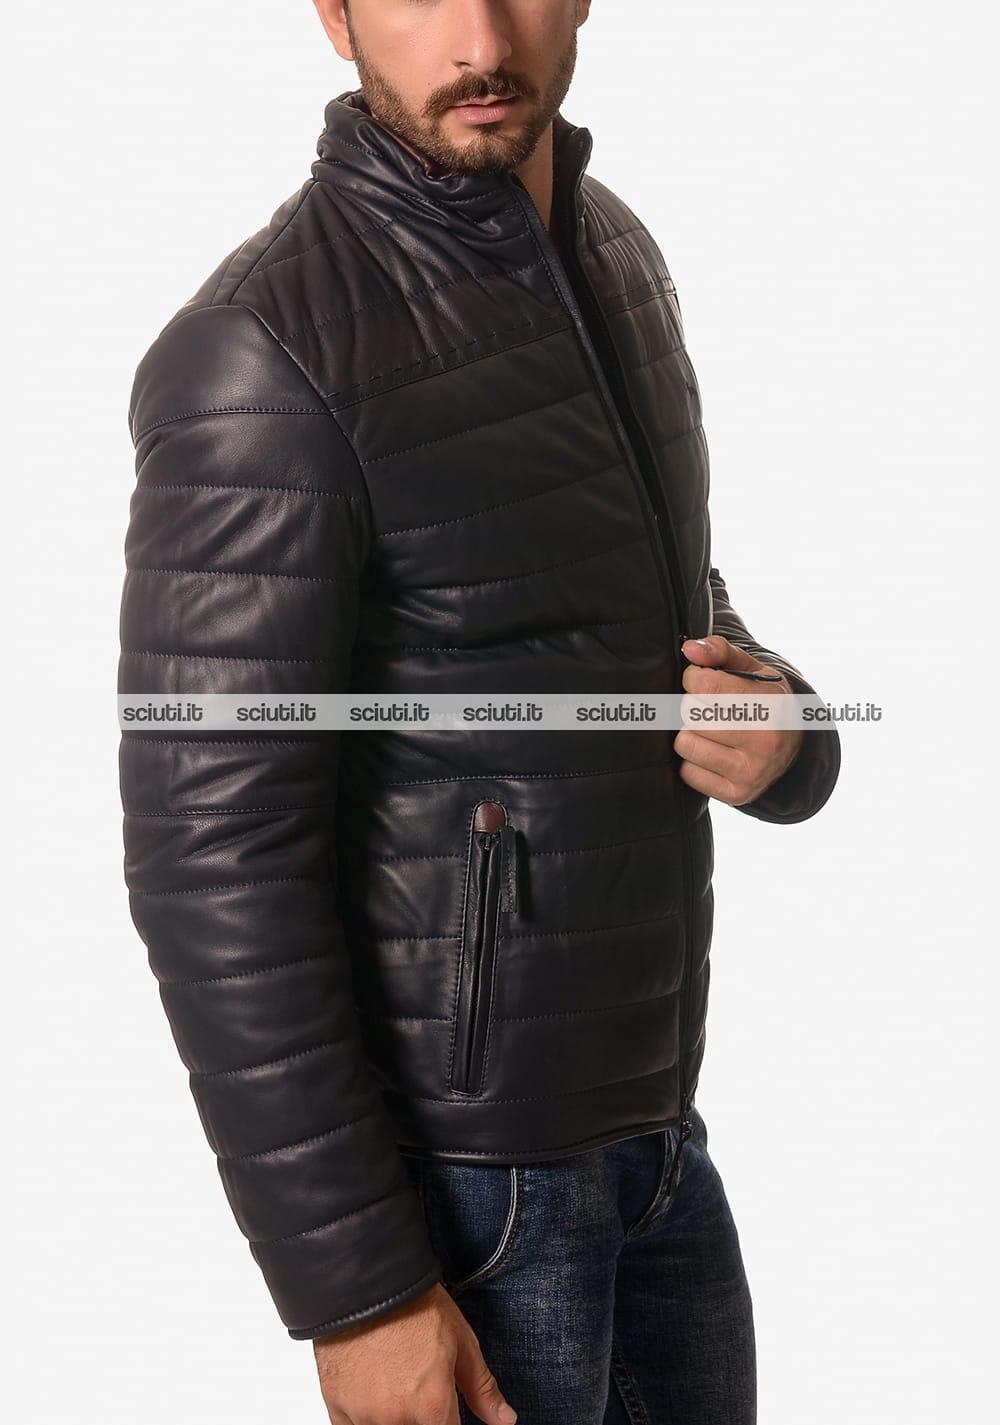 Giubbotto in pelle Harmont&blaine uomo biker blu scuro